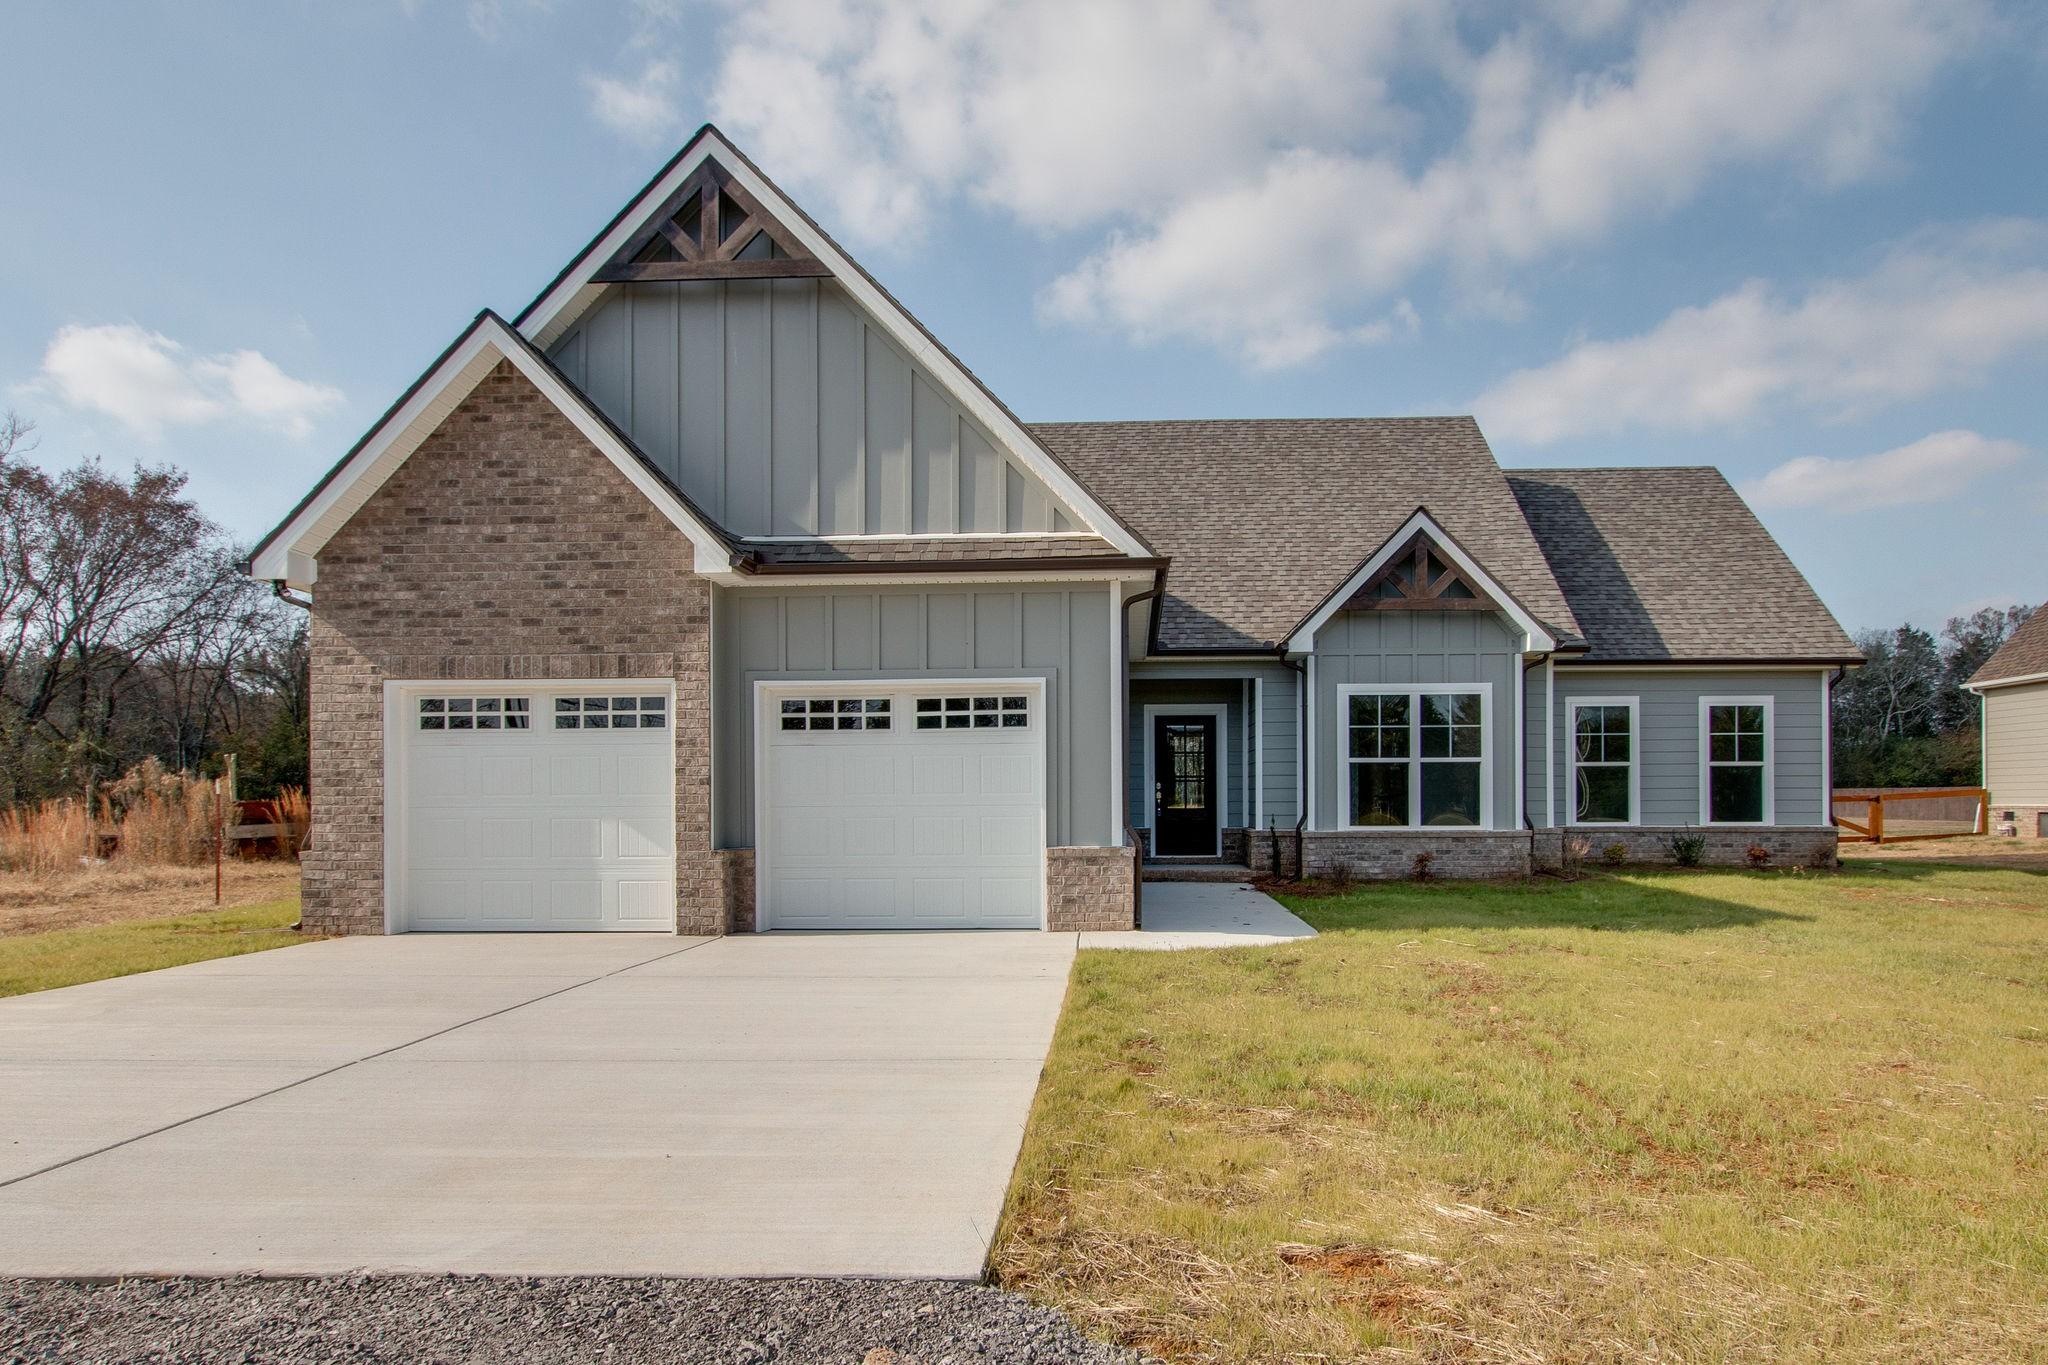 2534 Armstrong Valley Rd, Murfreesboro, TN 37128 - Murfreesboro, TN real estate listing